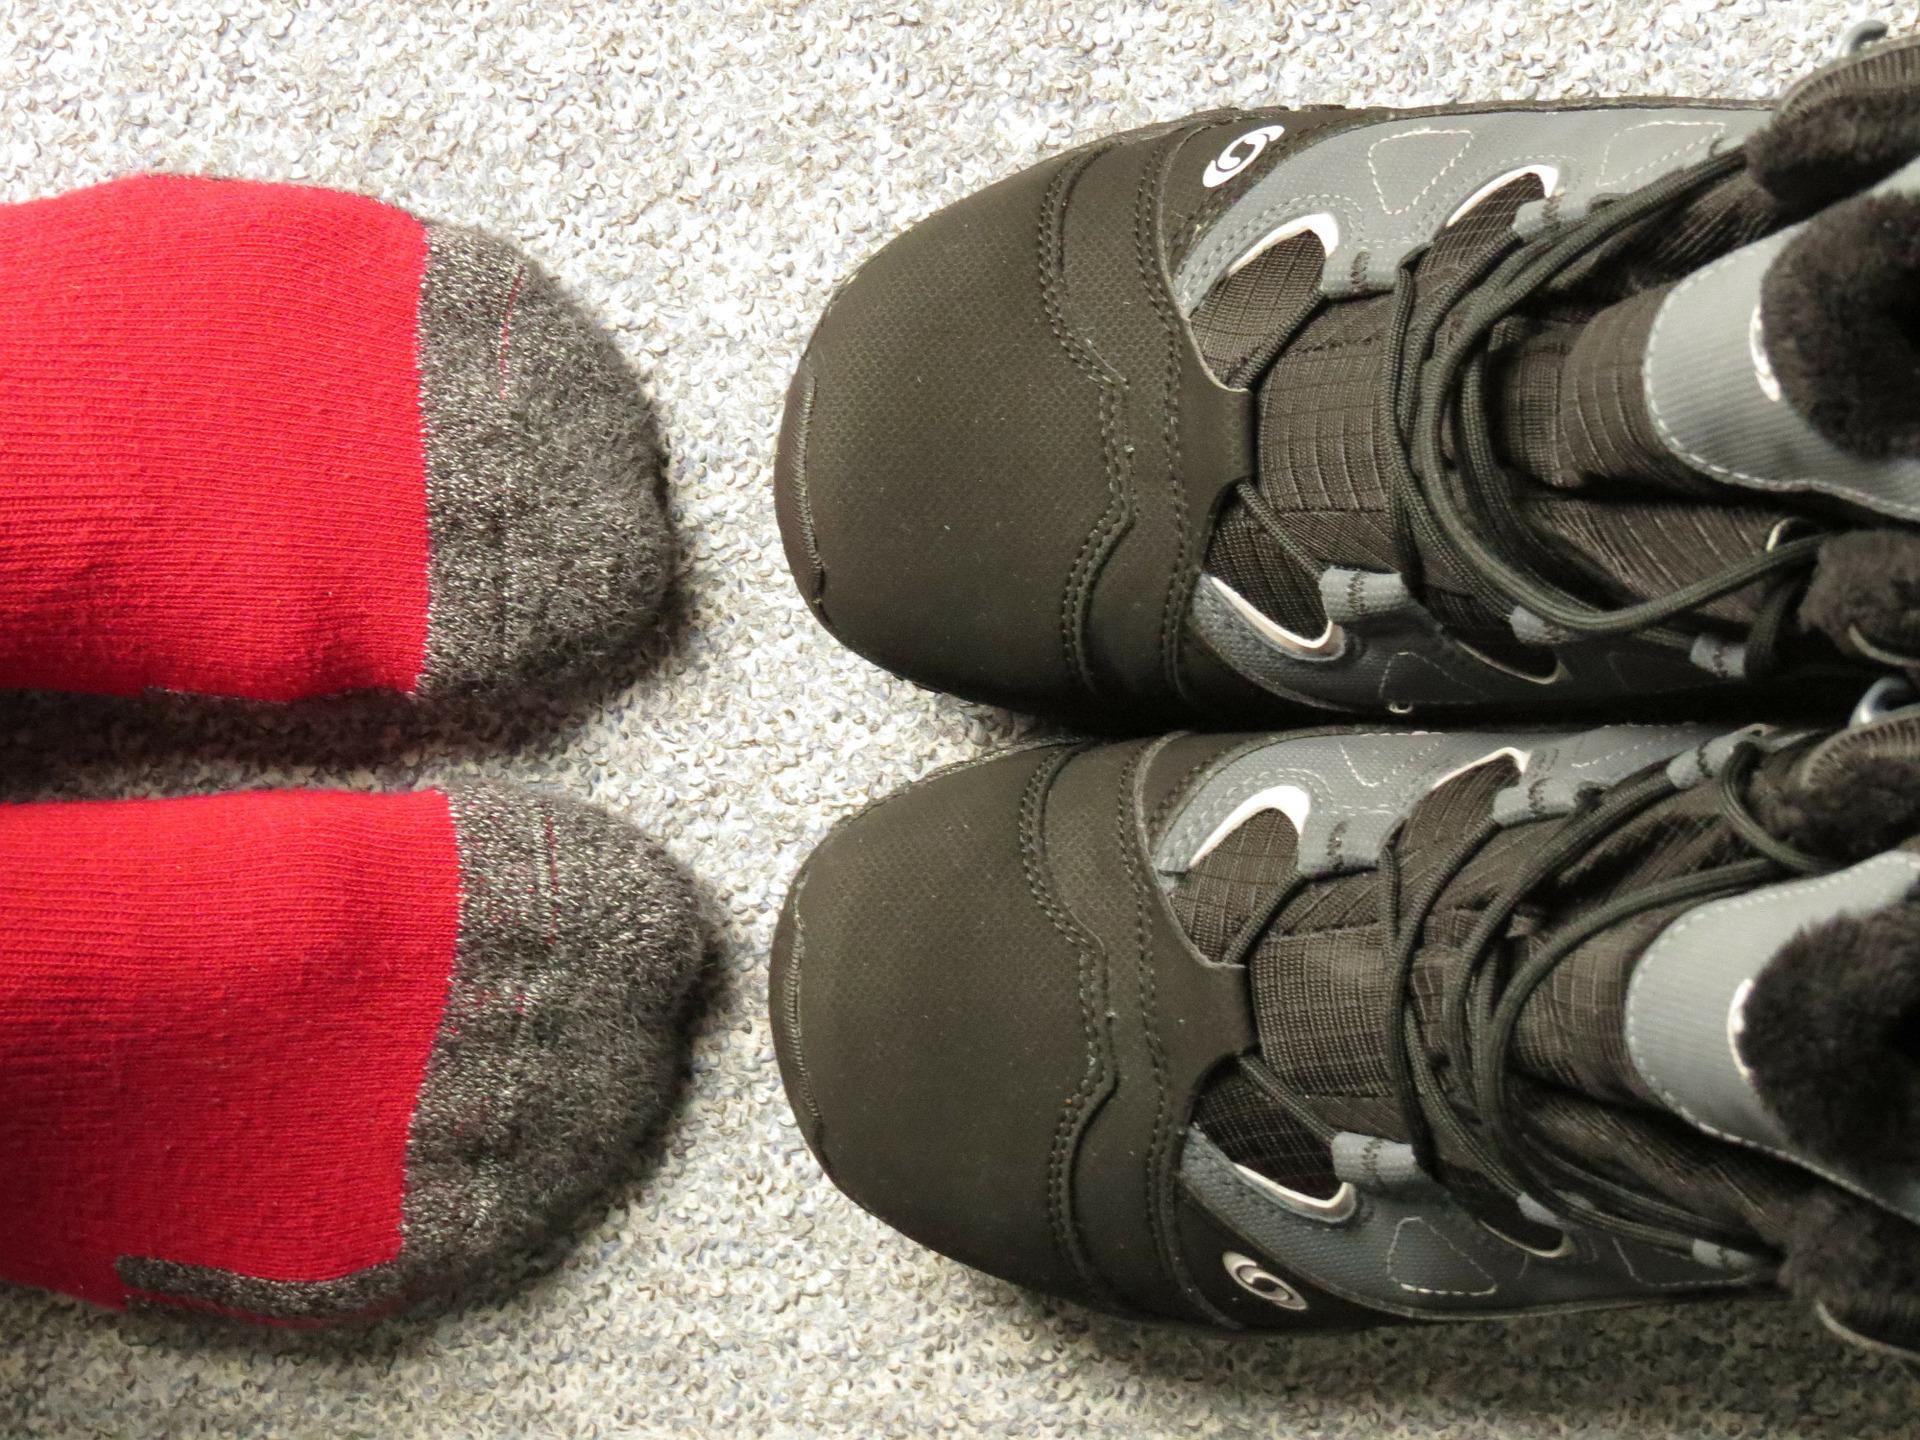 mejores-calcetines-de-esqui